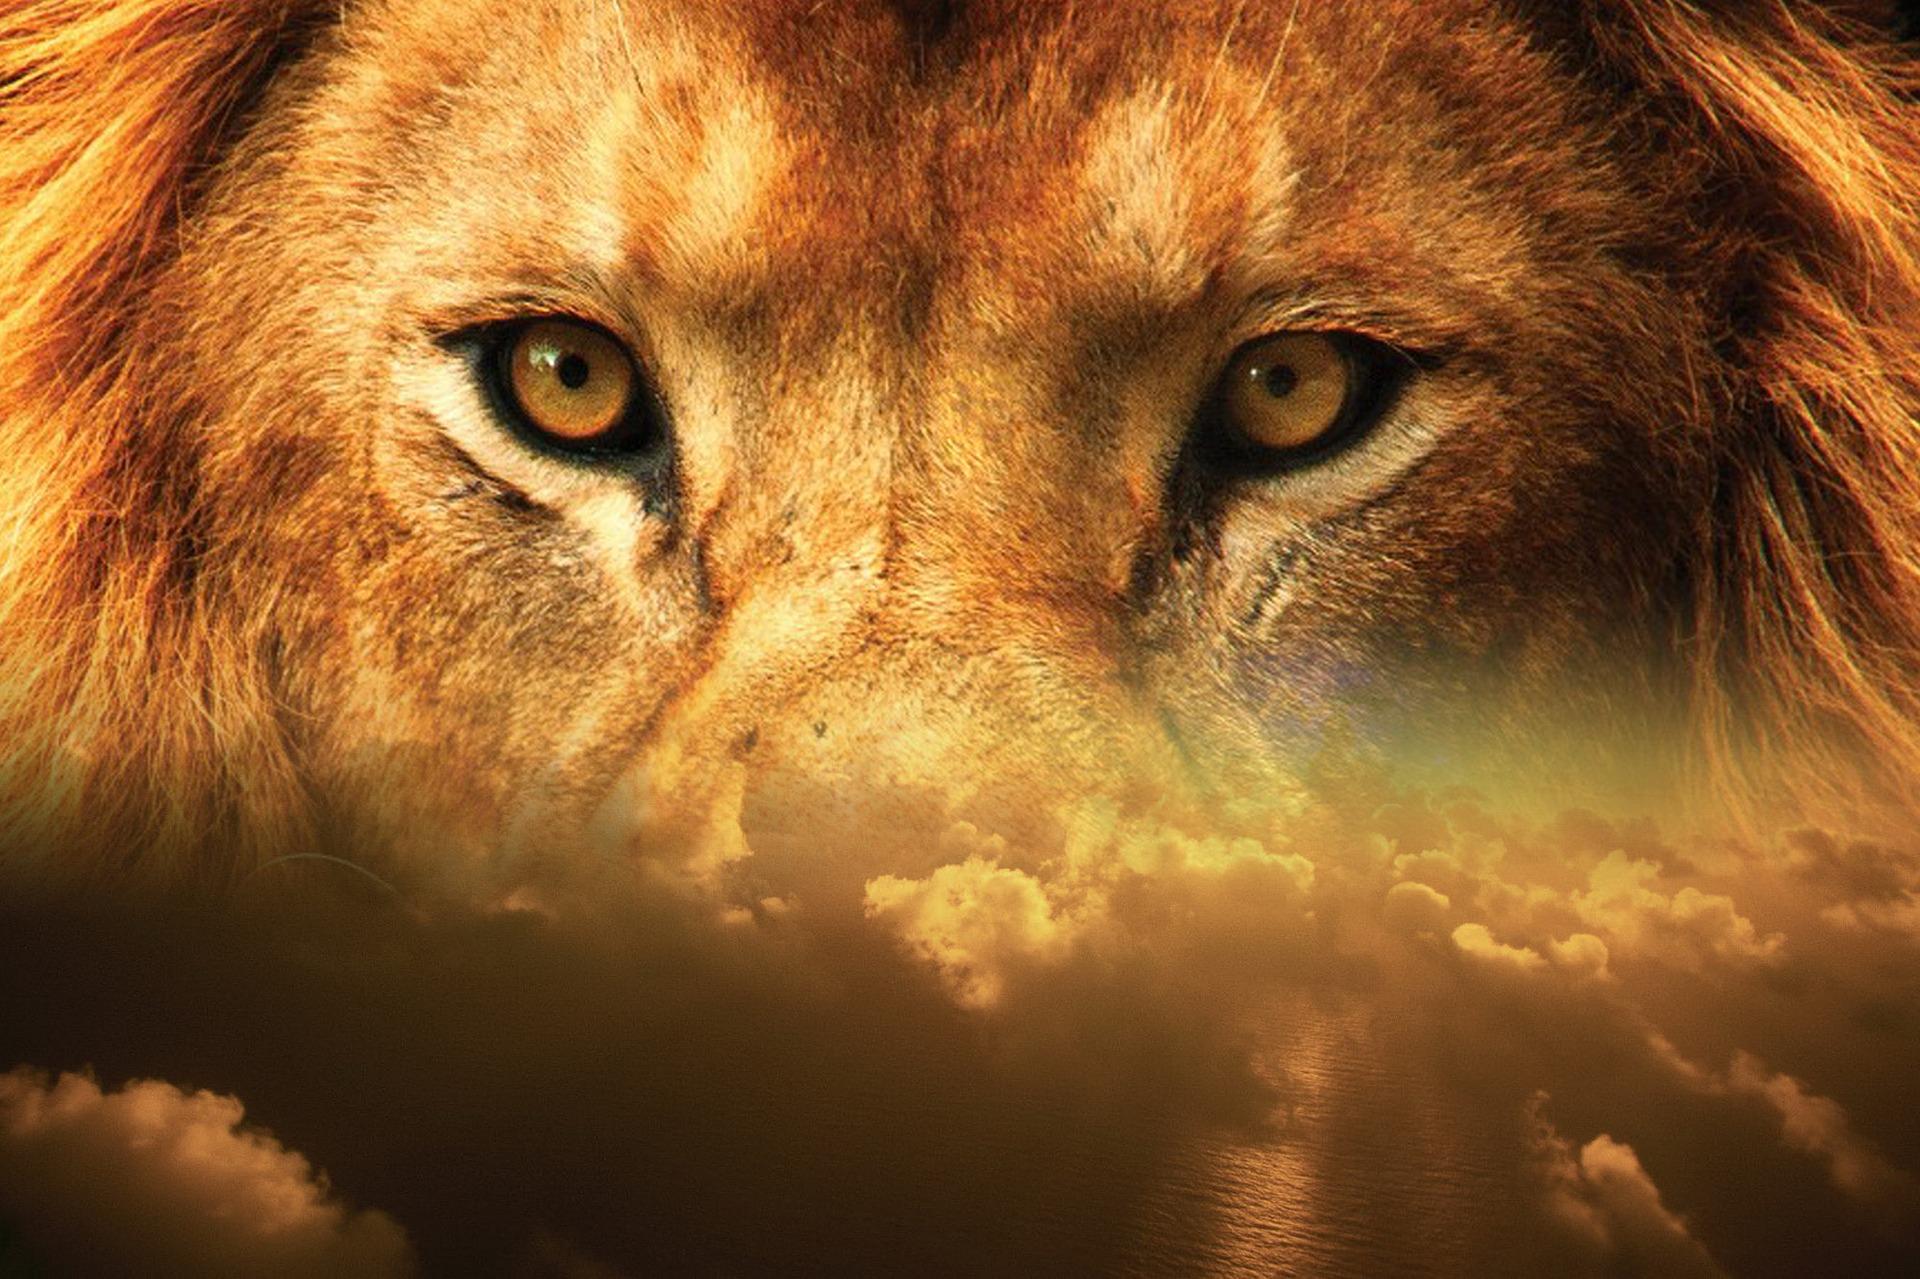 lion-2115592_1920.jpg